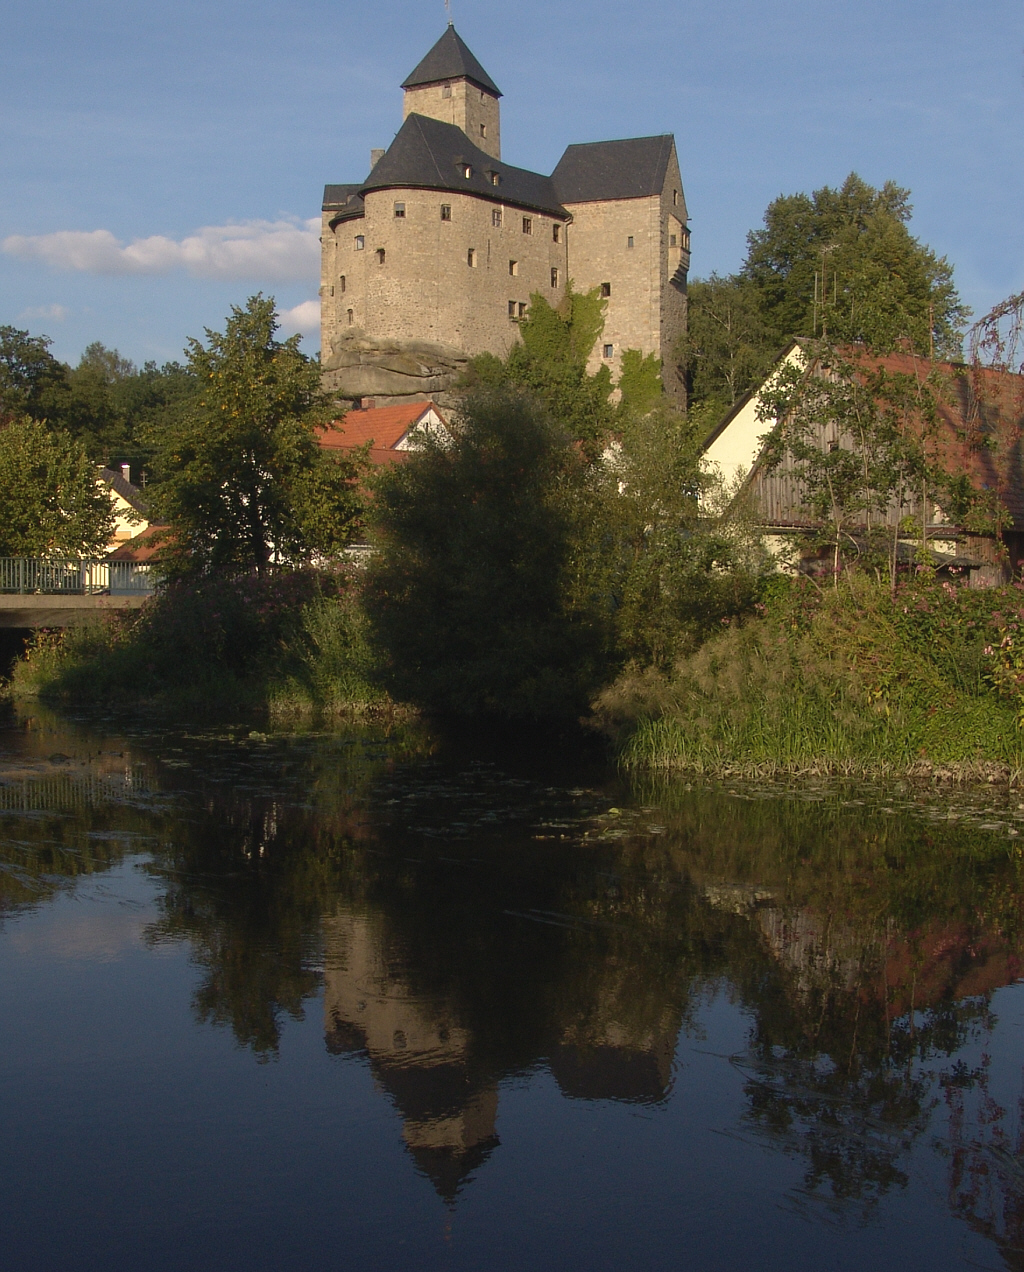 Falkenberg Burg